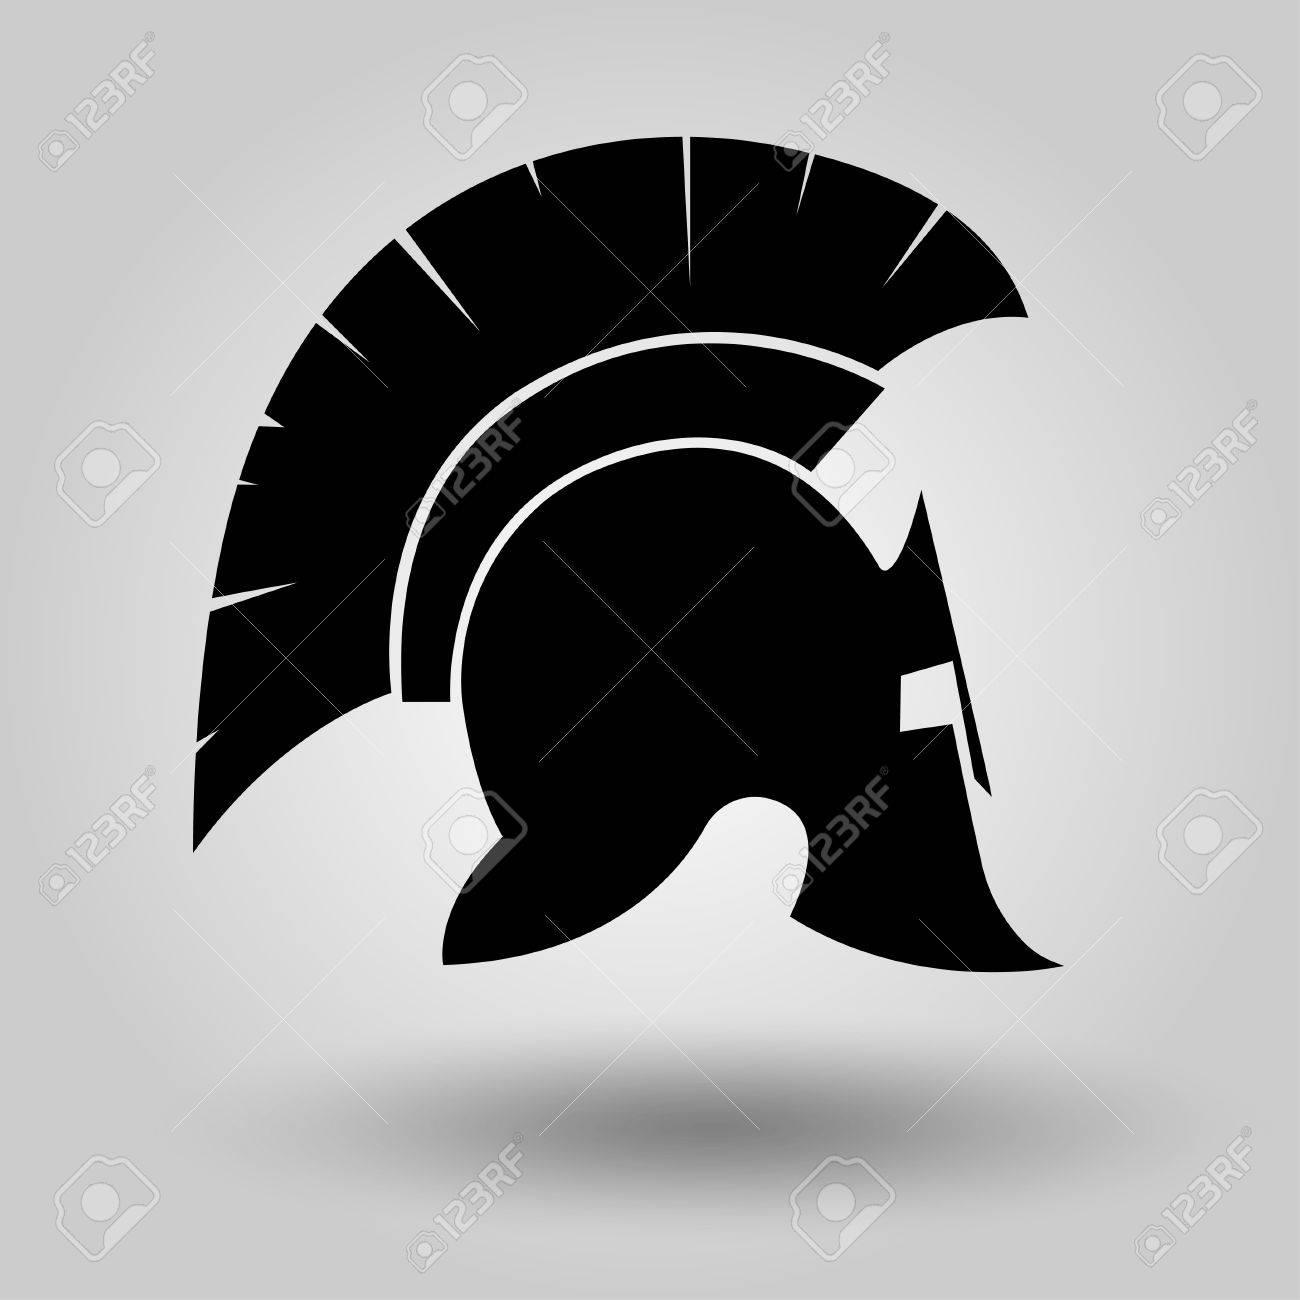 Spartan Helmet silhouette, symbol of gladiator soldier or greek warrior or roman legionary, helmet hero sign, vector - 55560166